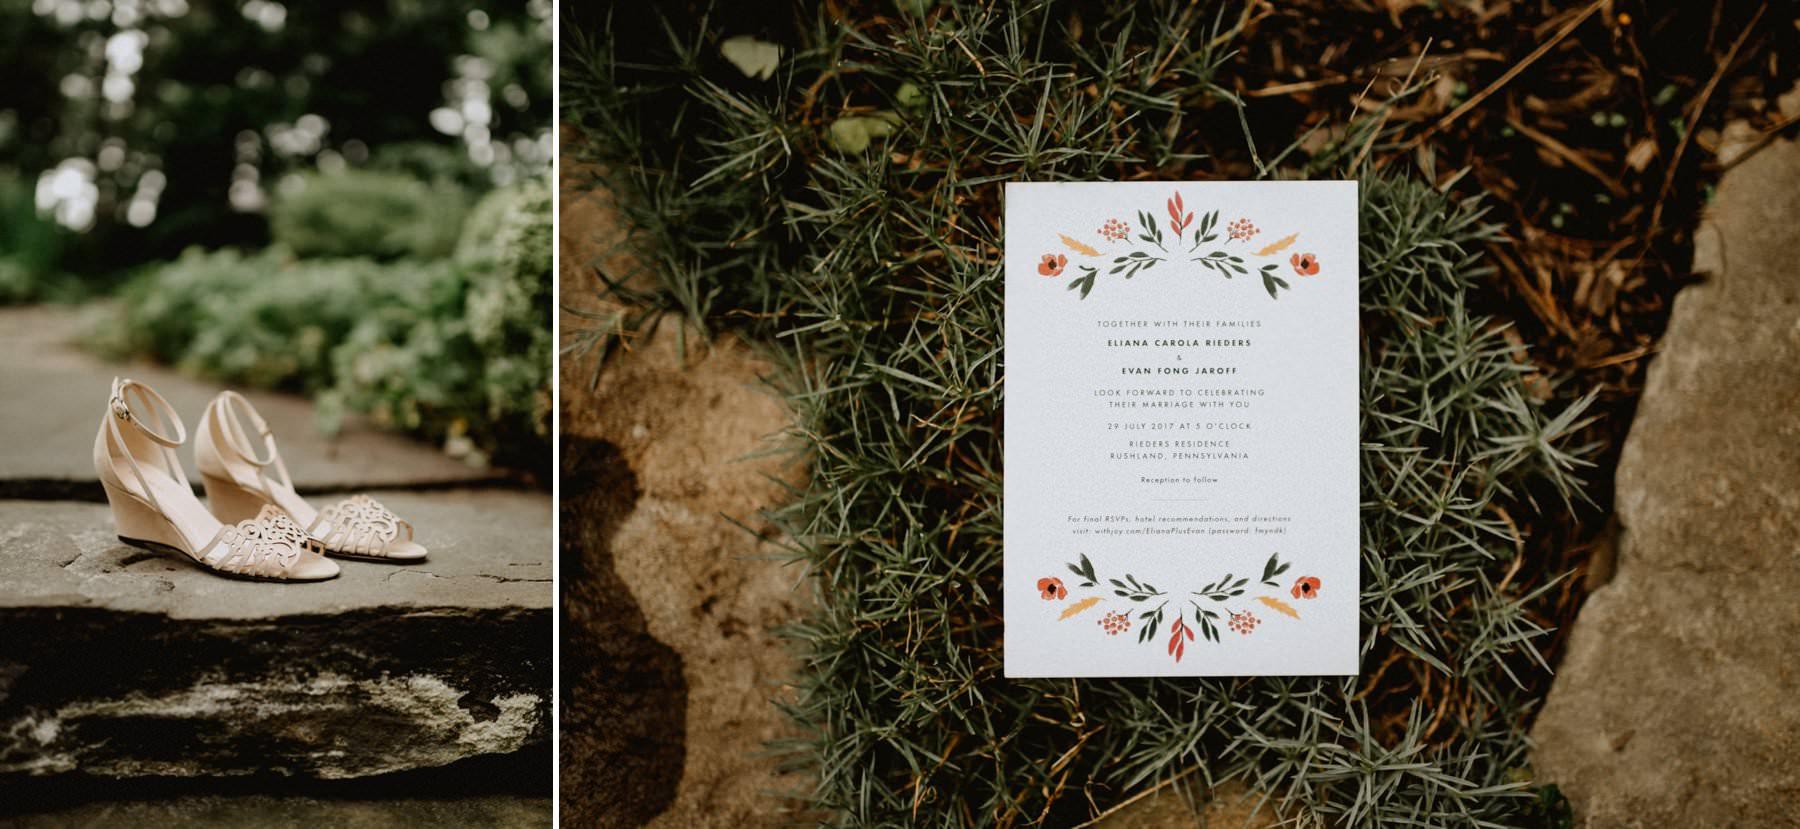 pennsylvania-private-estate-wedding-2.jpg